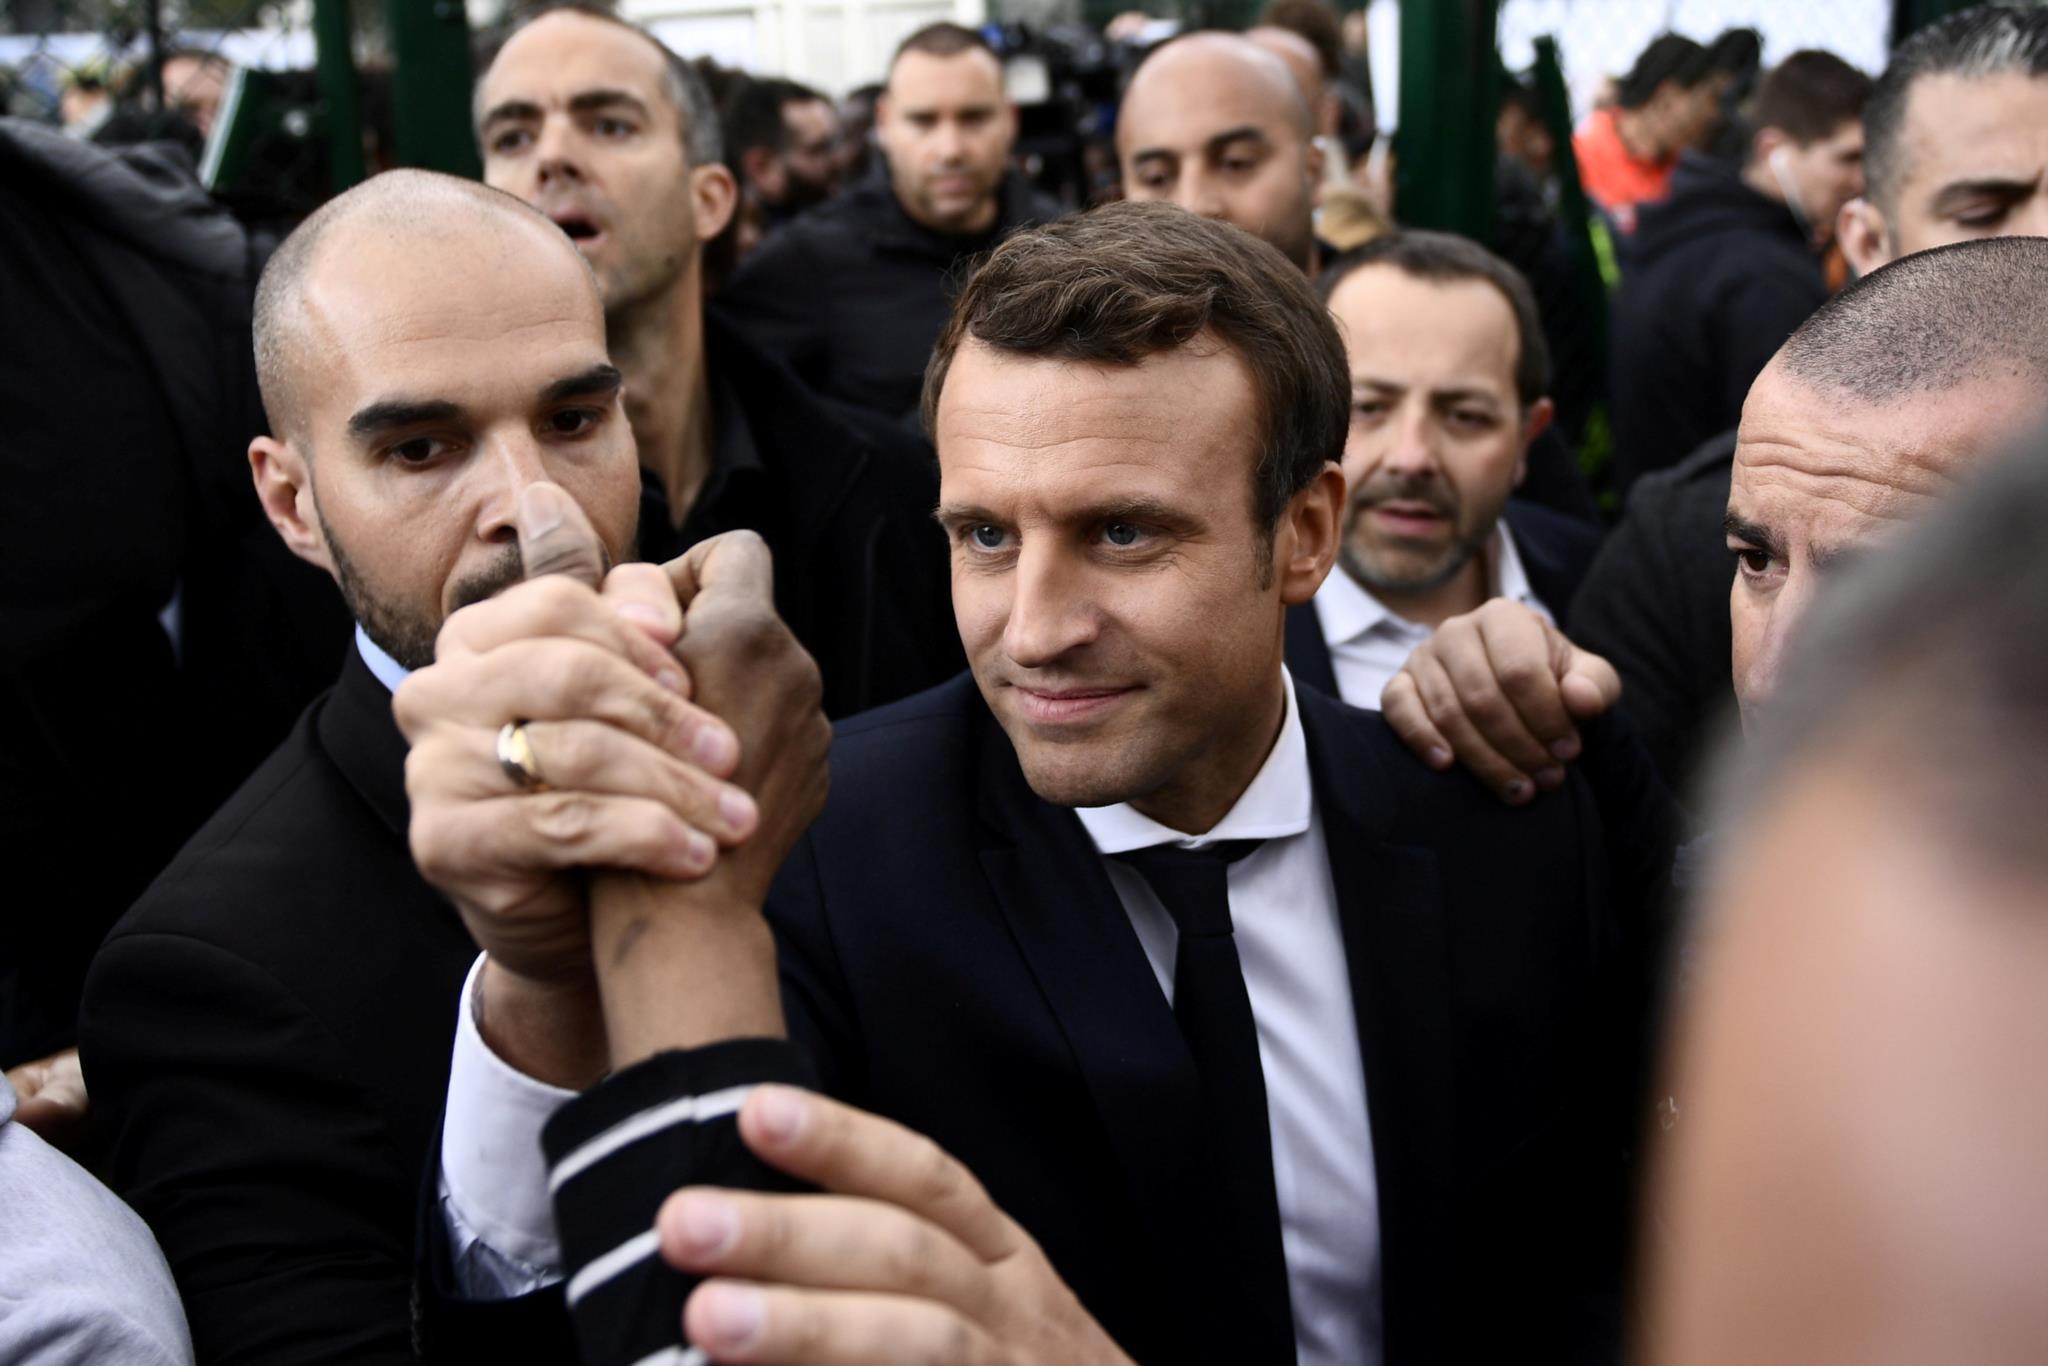 PÚBLICO - Sondagem em França: Macron em vantagem, mas Le Pen recupera terreno